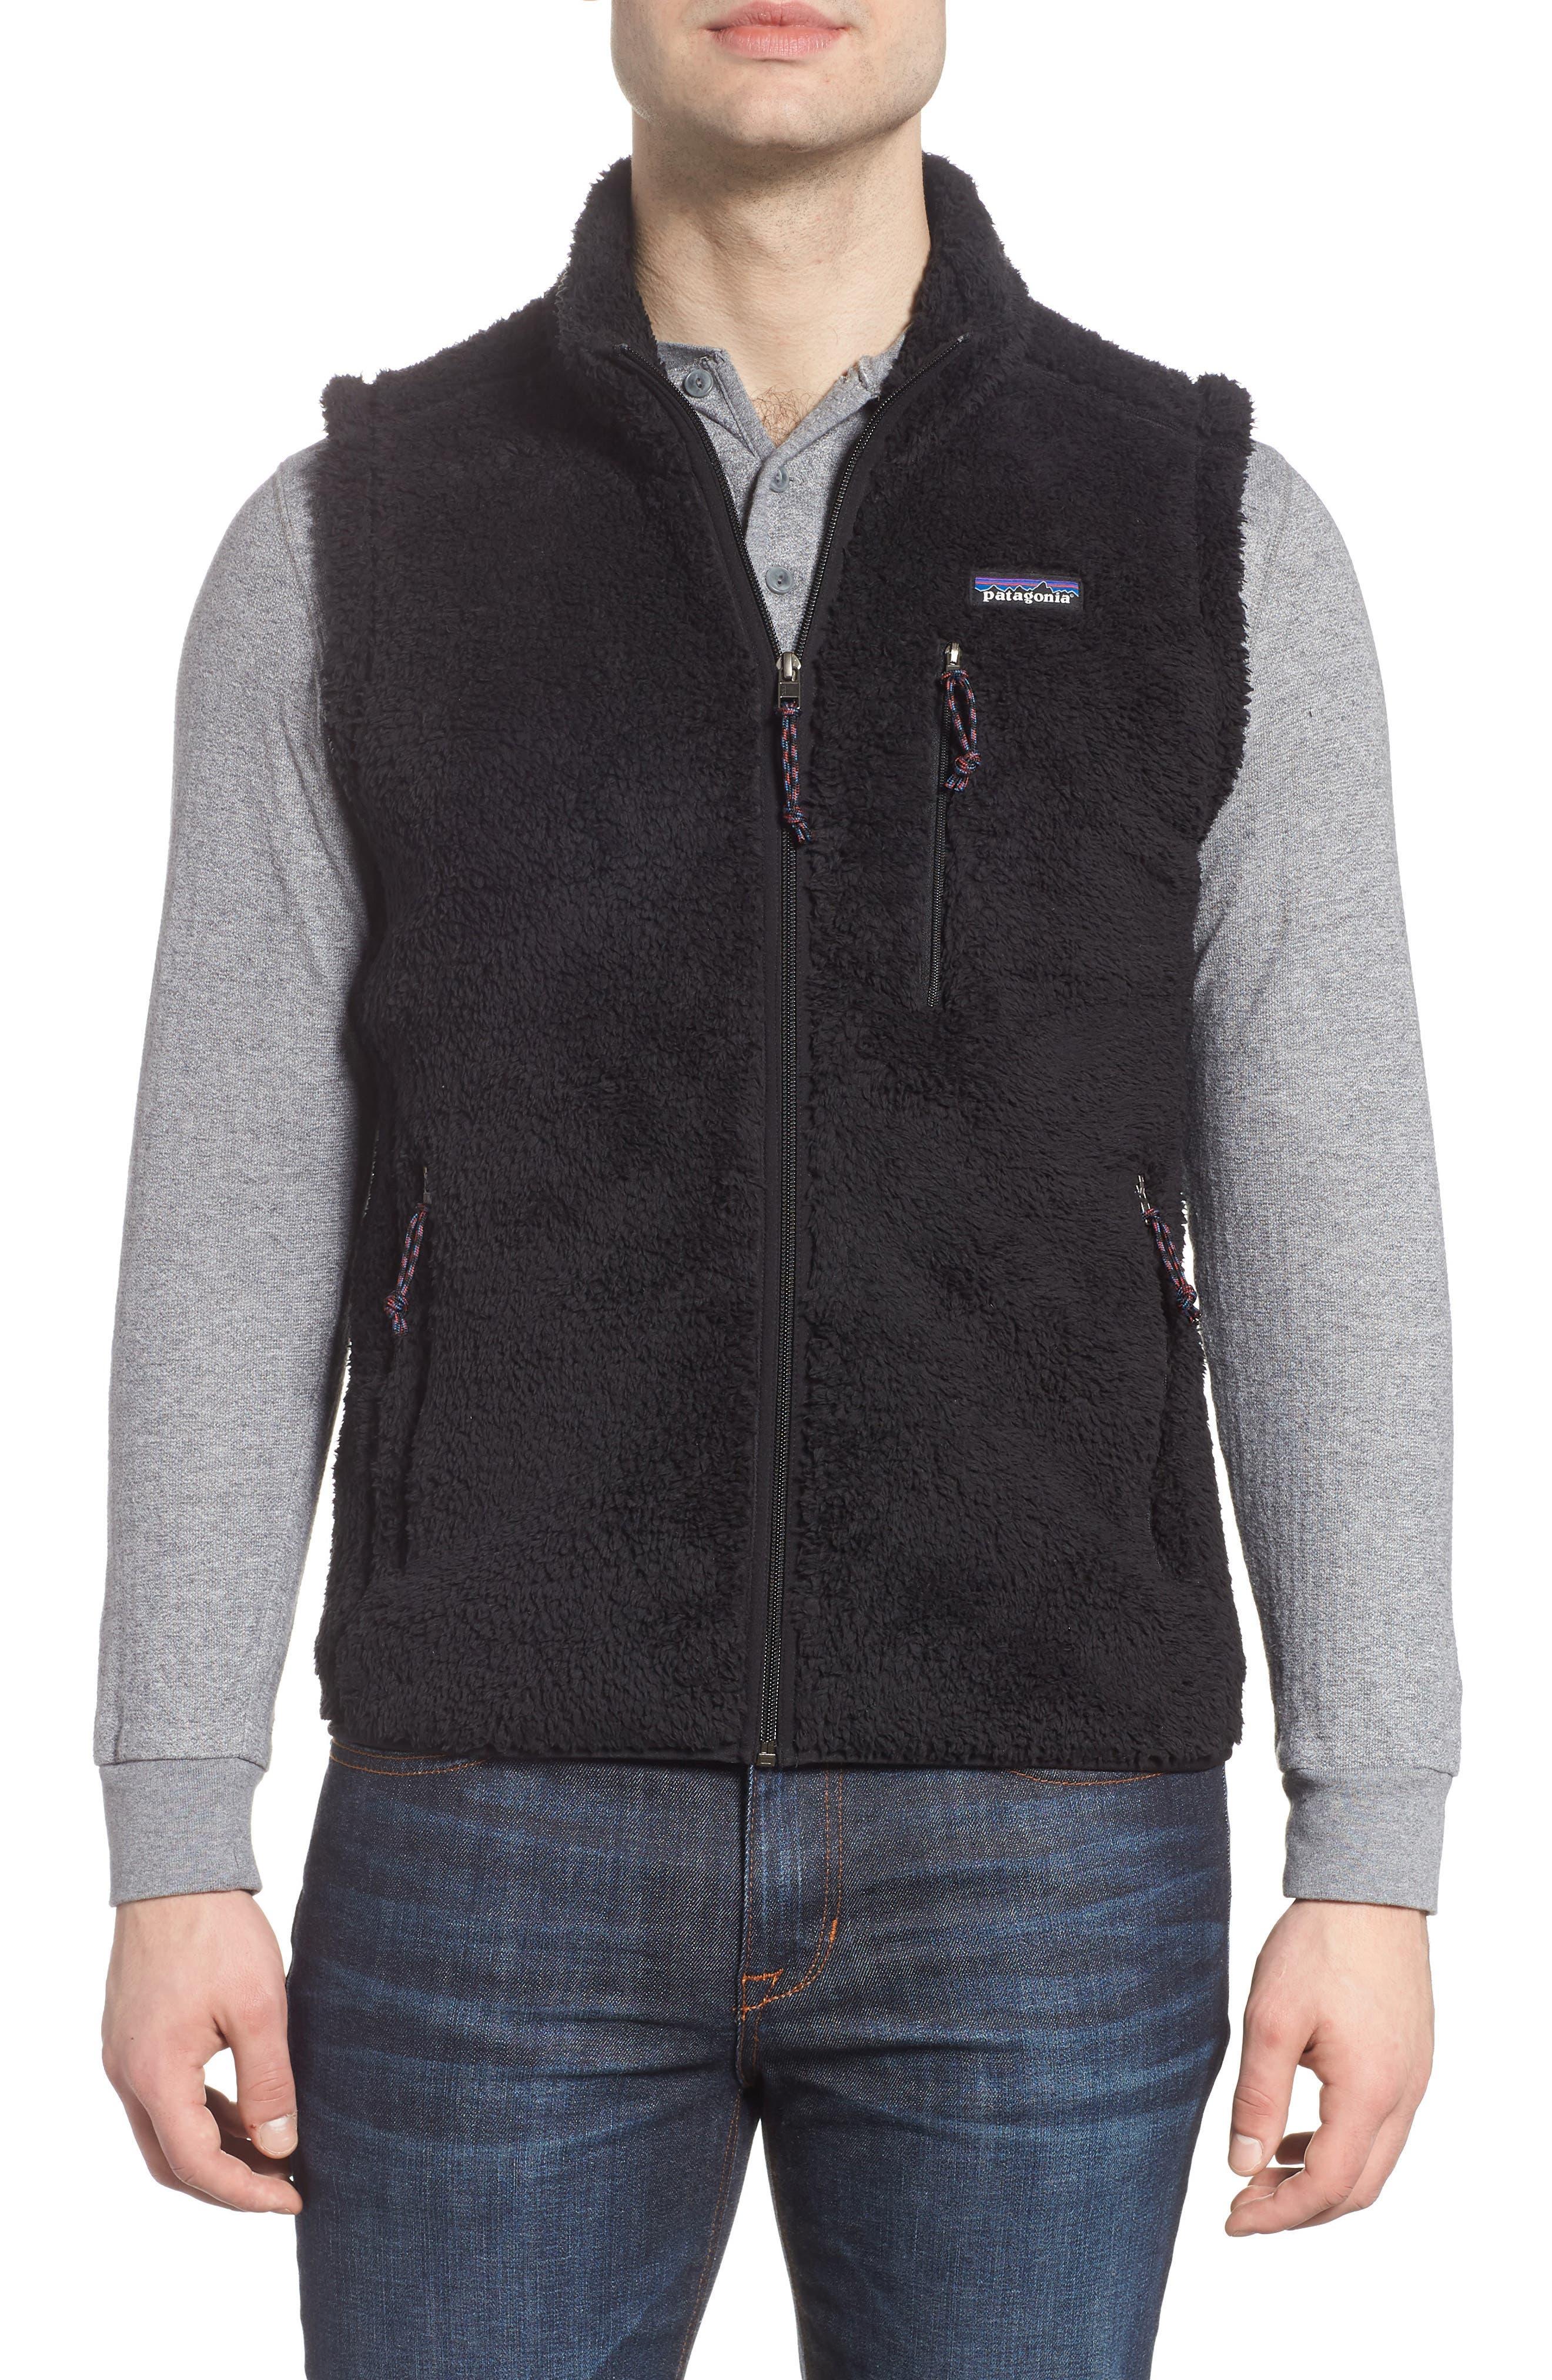 Los Gatos Fleece Vest,                             Main thumbnail 1, color,                             BLACK